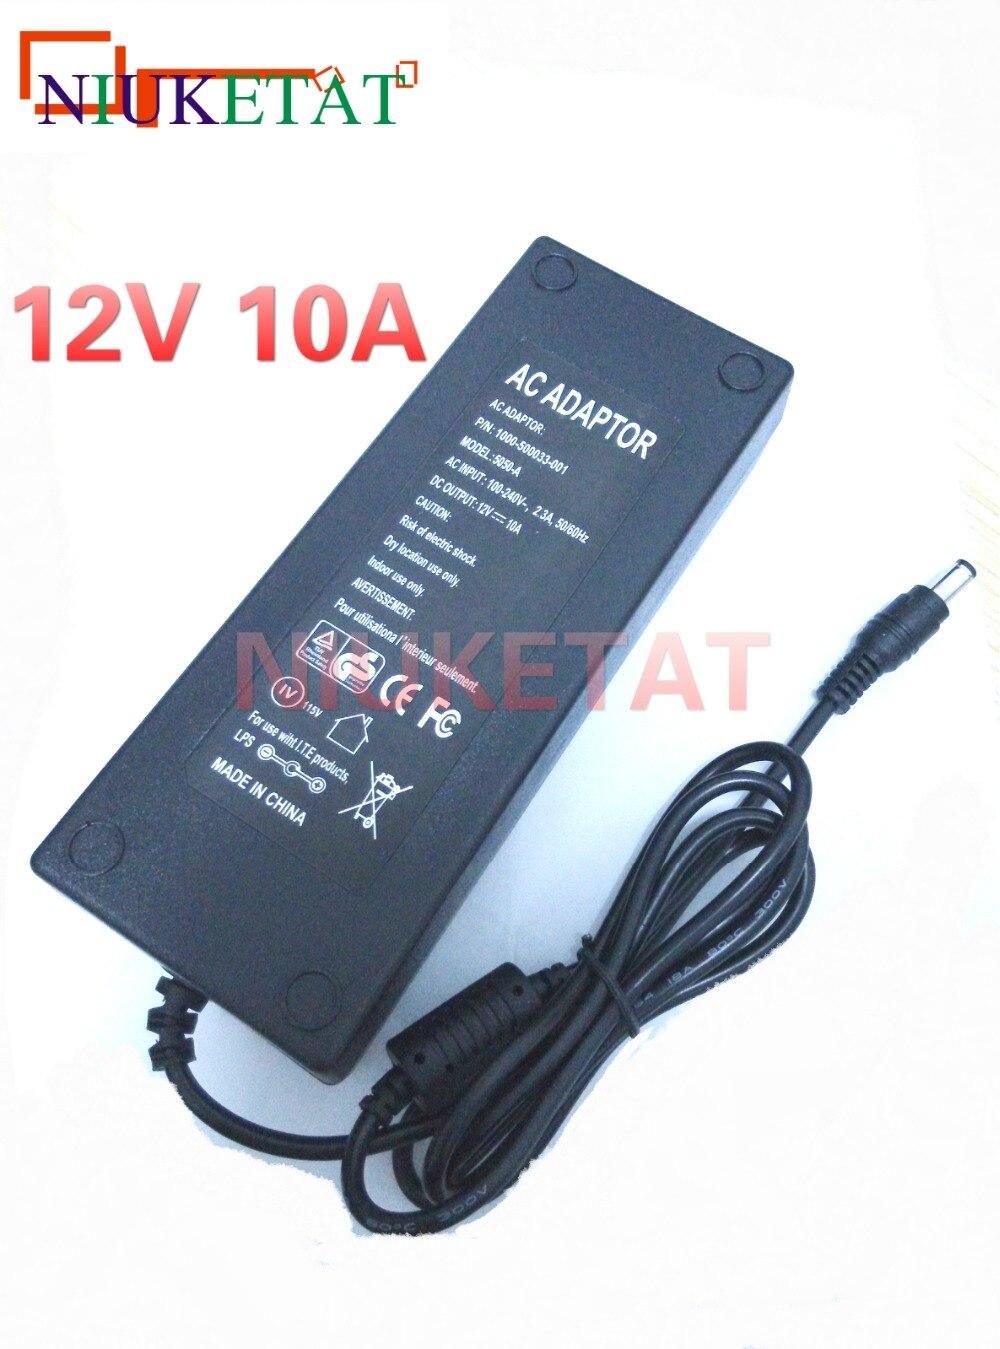 LX1210 DC 12V 10A Power 12V10A AC 100V-240V LED RGB power adapter LED drive Power Supply for LED strip 5050 2835 12V 10A power